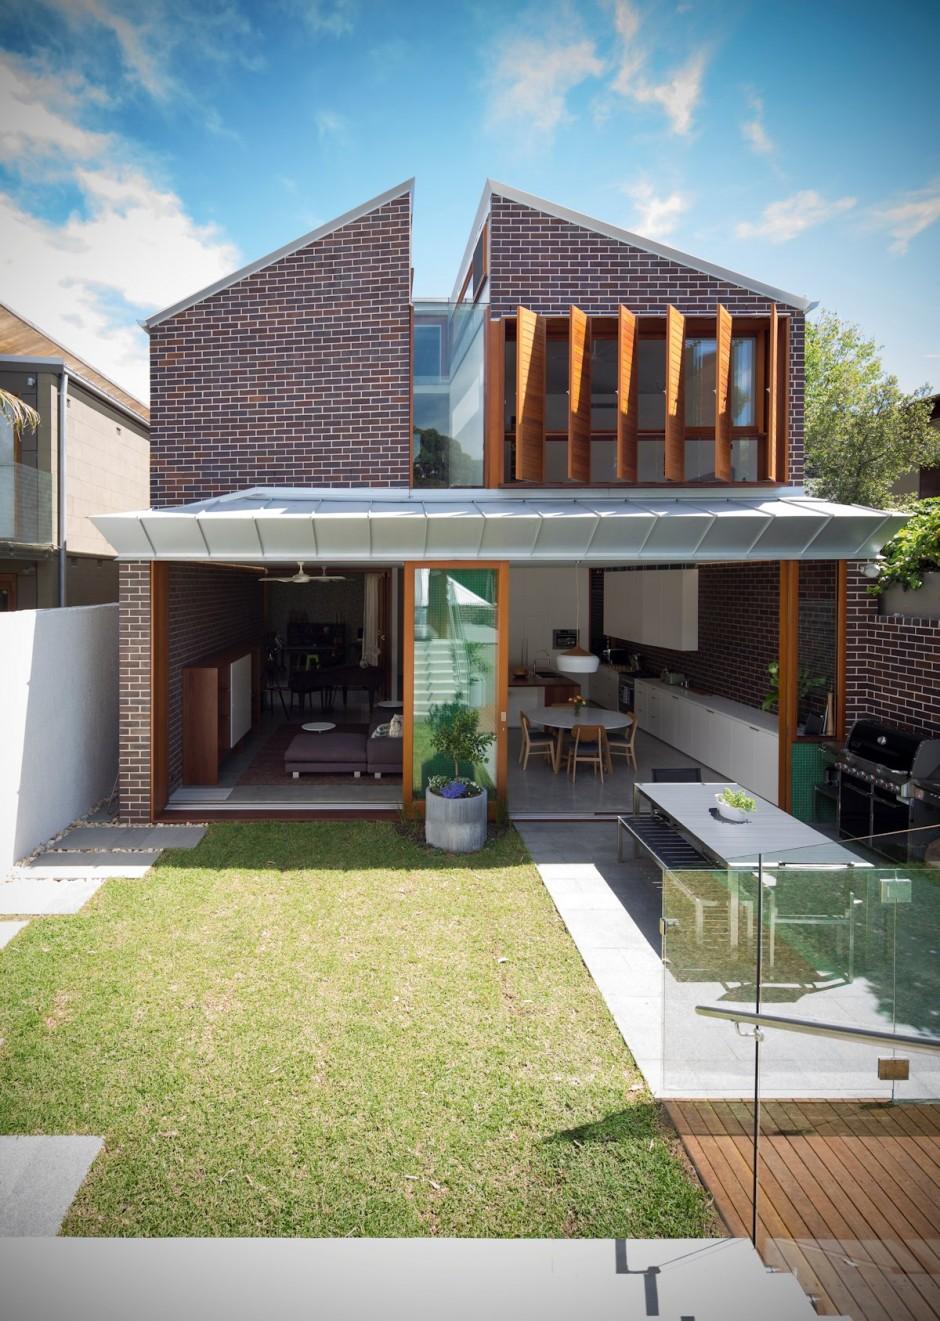 Dise o de casa moderna de dos pisos en terreno largo - Casas en tavernes de la valldigna ...